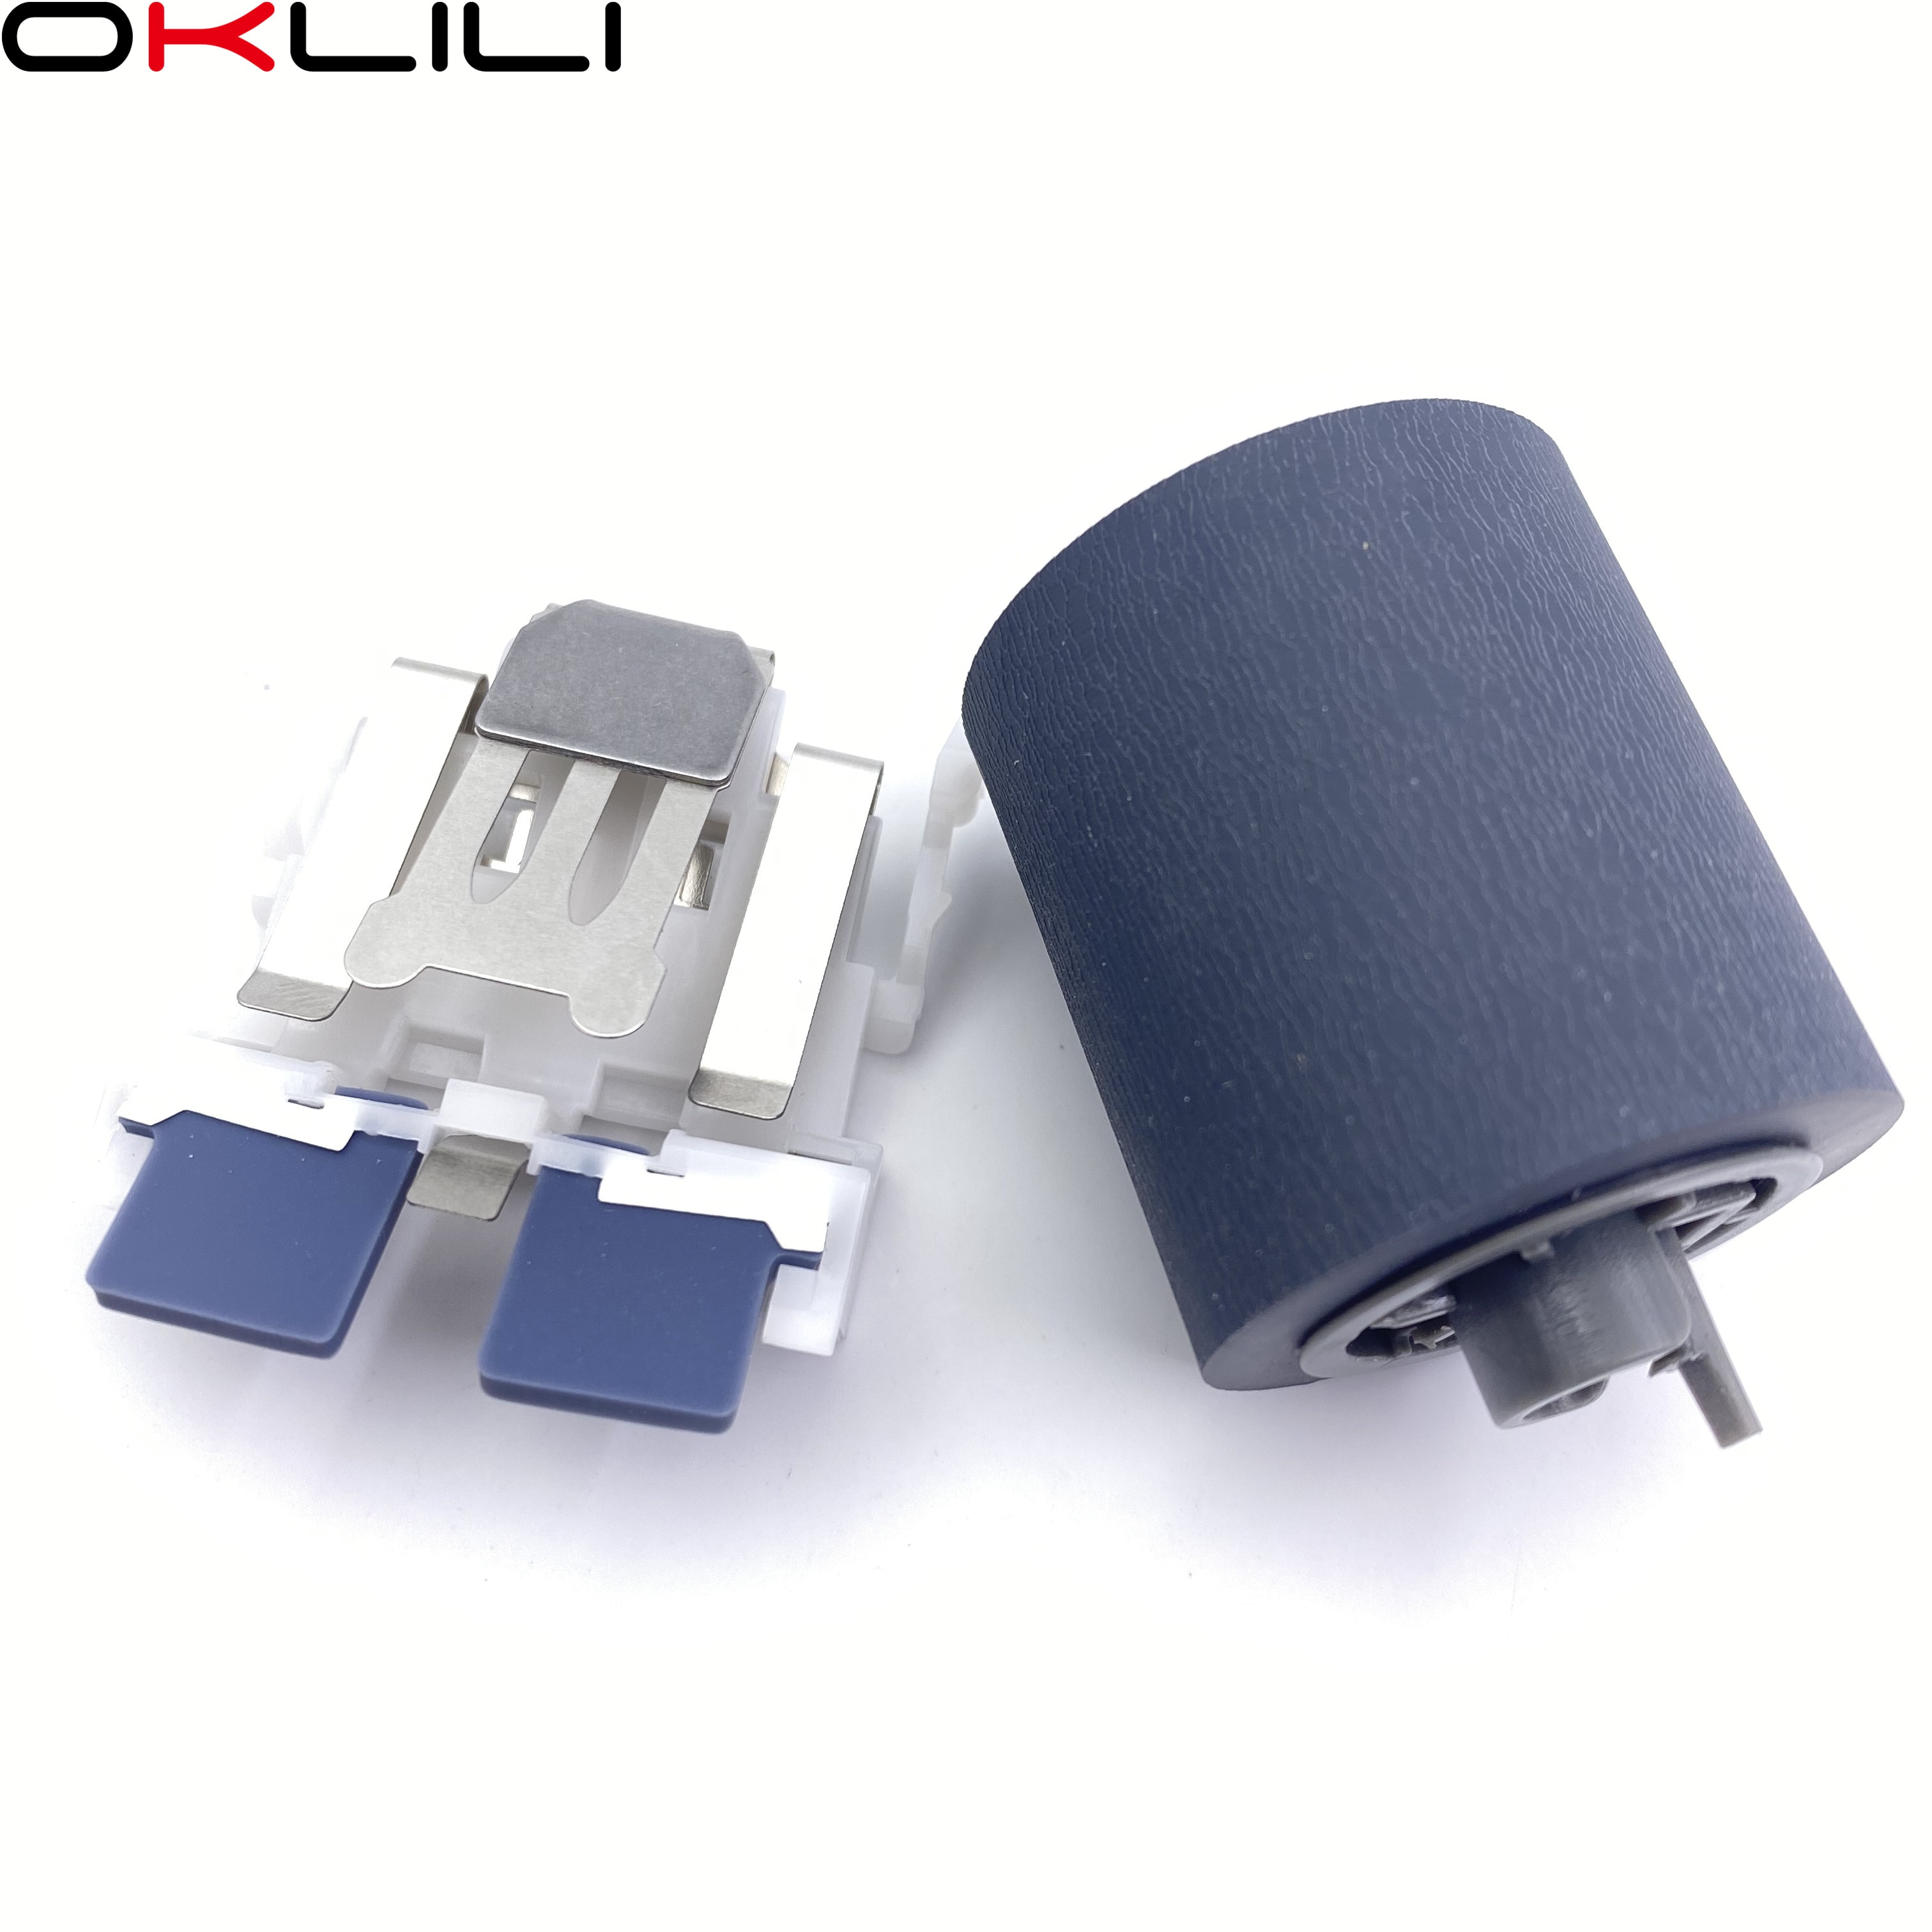 1 X PA03586-0001 PA03586-0002 Verbrauchs Pick Roller Pad Assy Montage Pickup Trennung für Fujitsu S1500 S1500M fi-6110 N1800